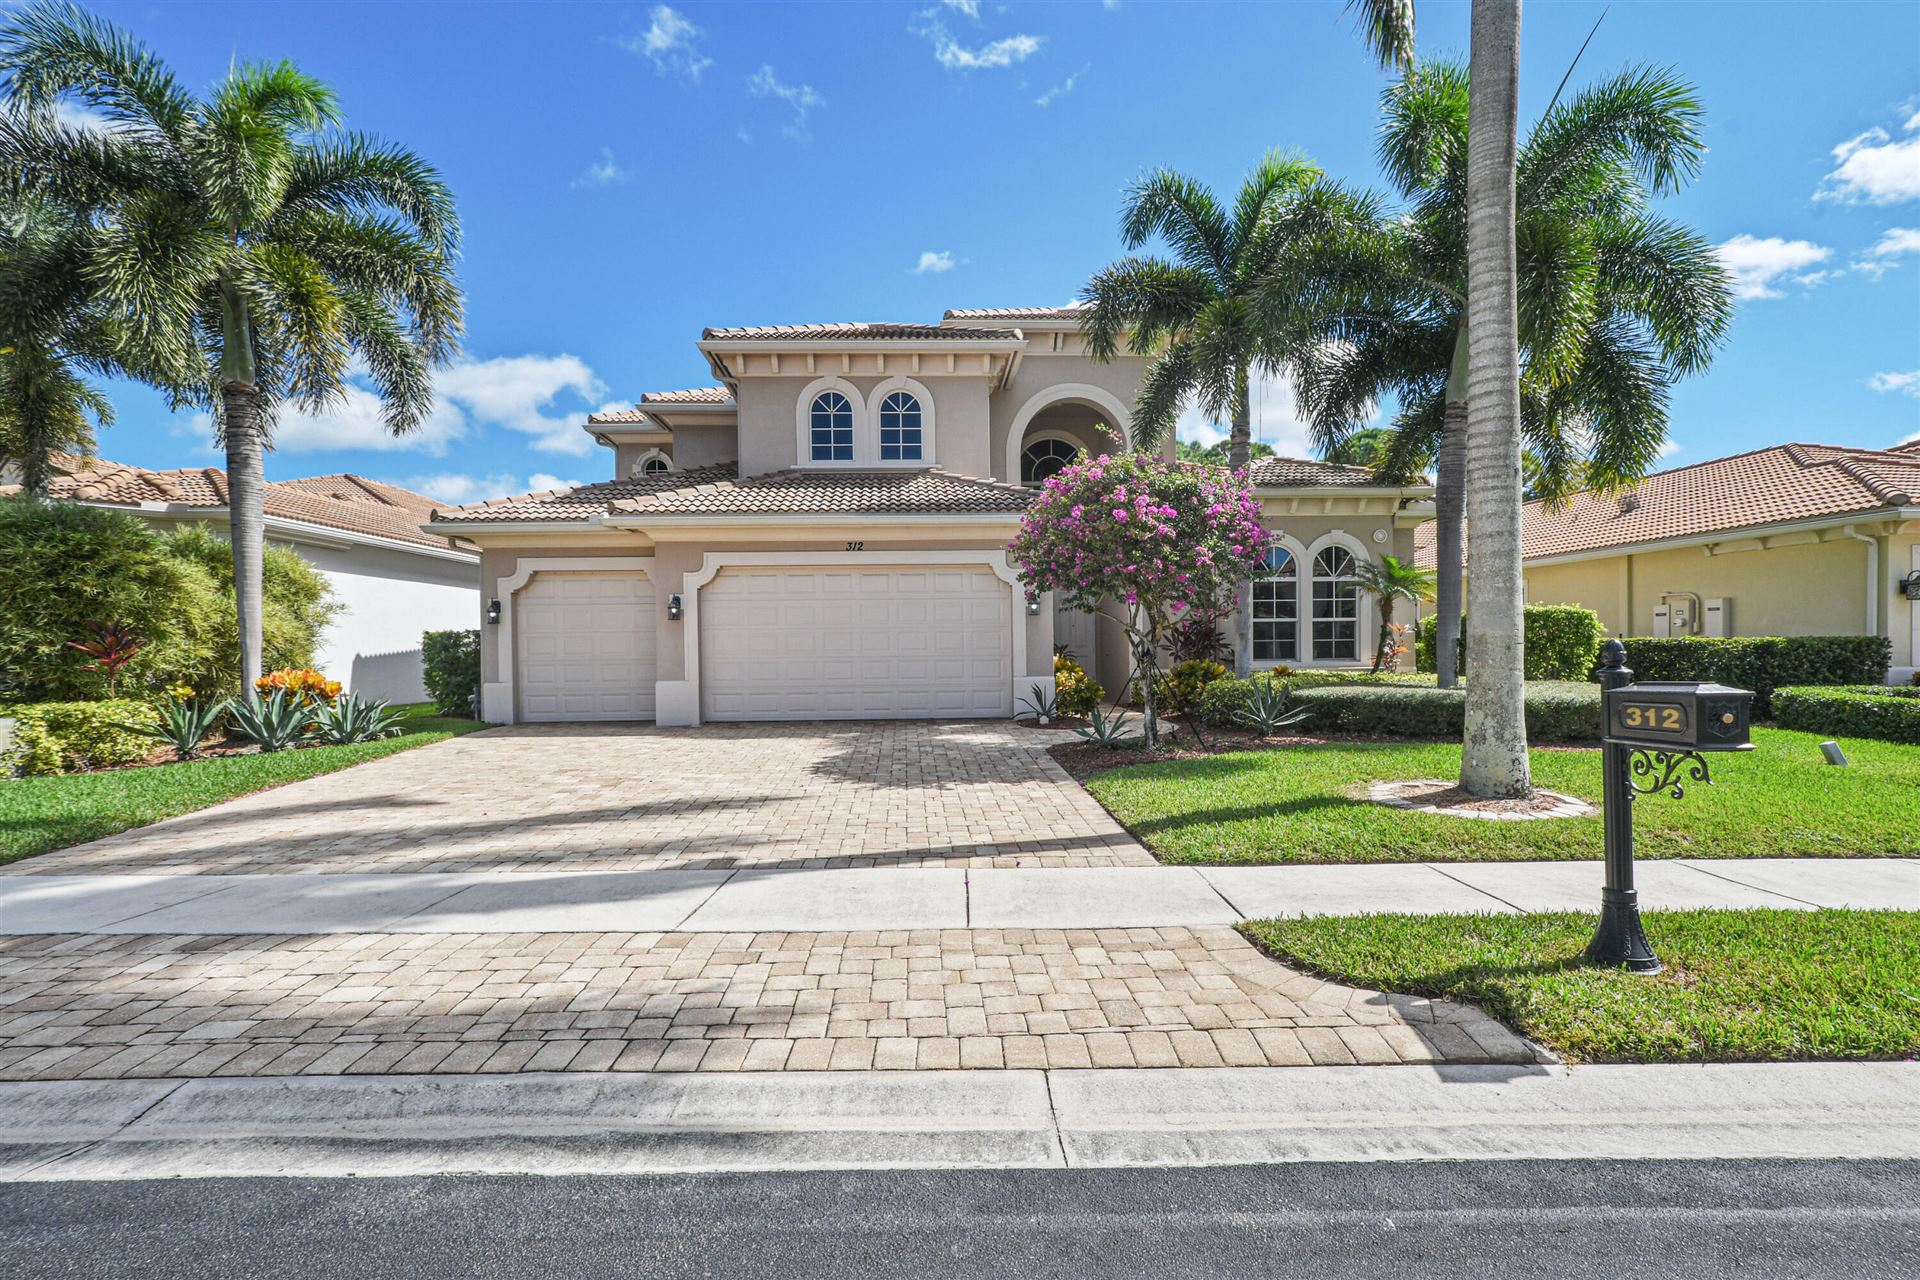 312 Charroux Drive, Palm Beach Gardens, FL 33410 - MLS#: RX-10753450